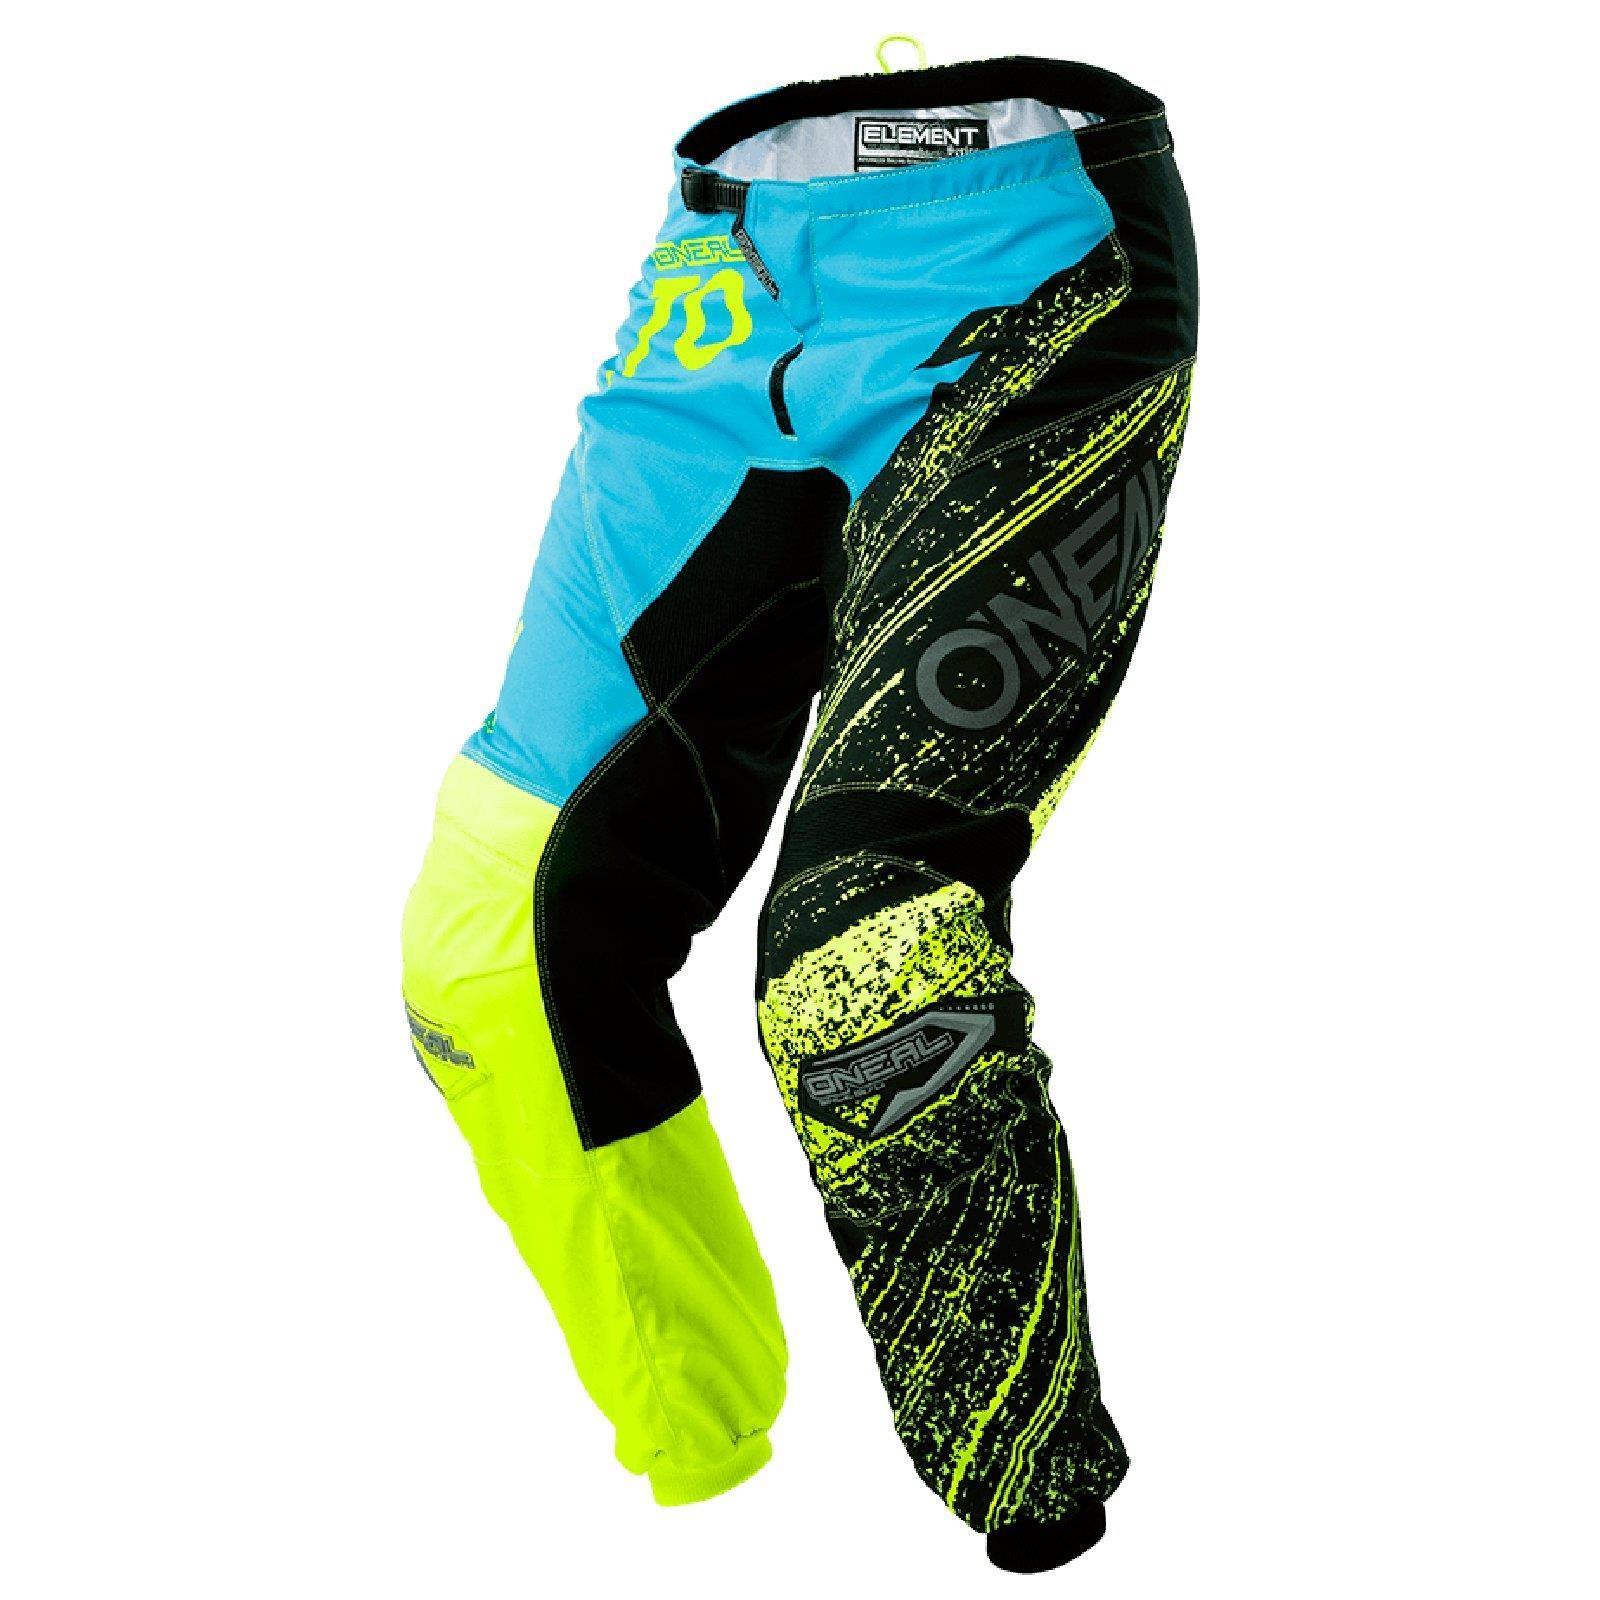 ONEAL-Element-Burnout-MX-Moto-Cross-Trousers-Pant-Enduro-Mountain-Bike-MTB-Downhill thumbnail 6